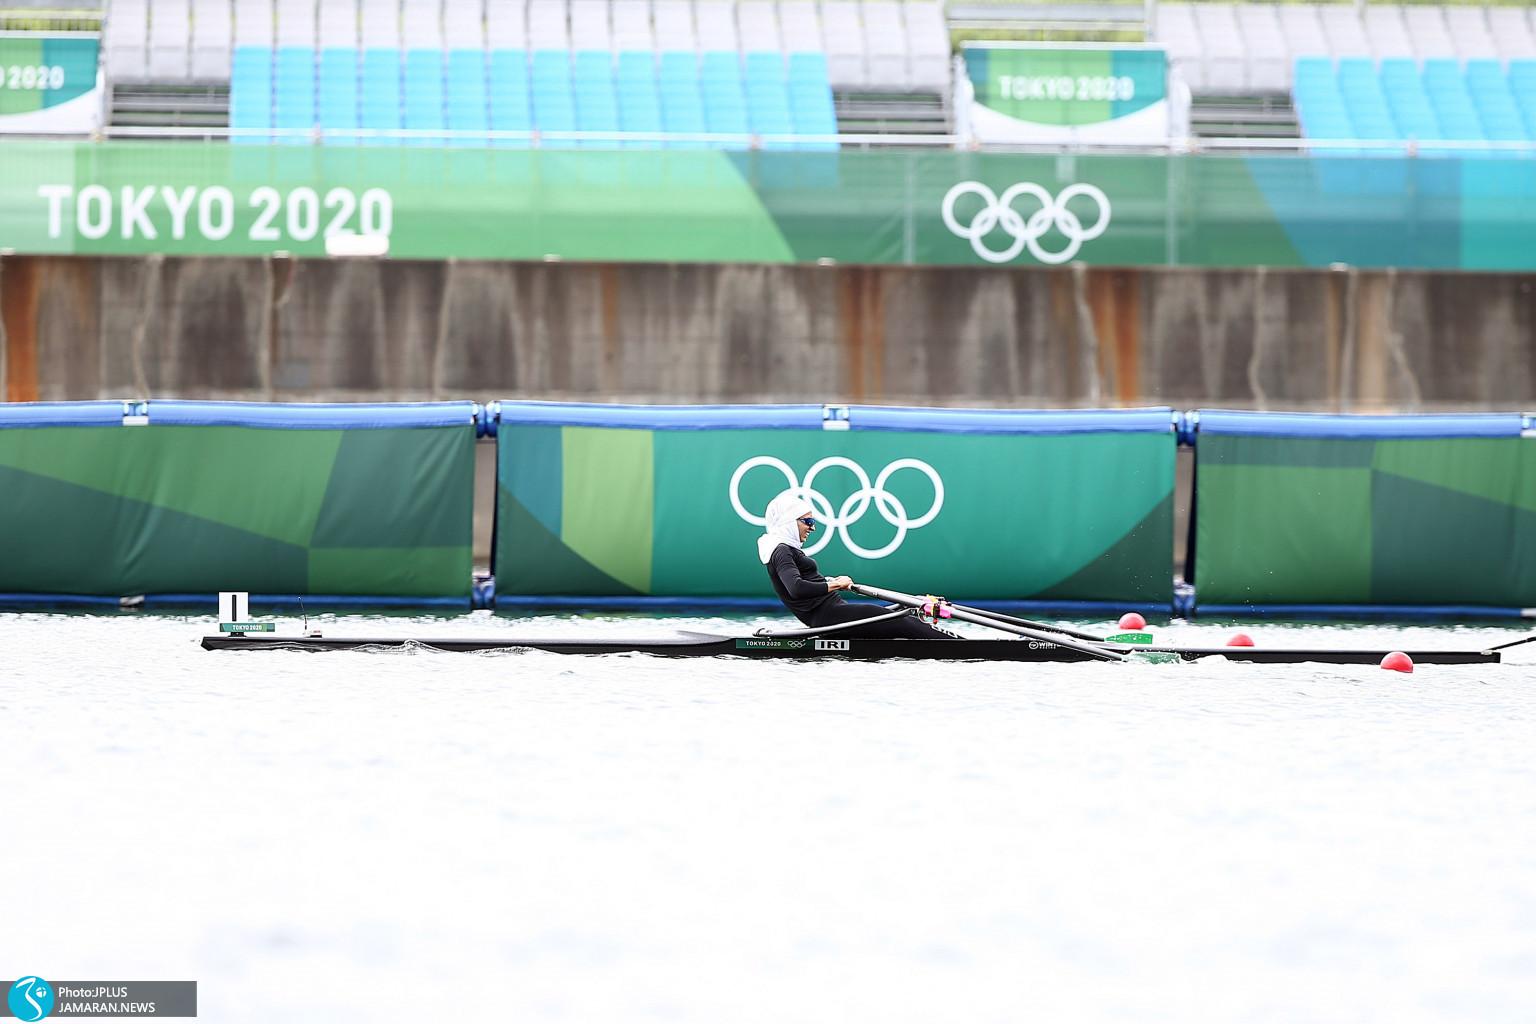 نازنین ملایی قایقرانی المپیک